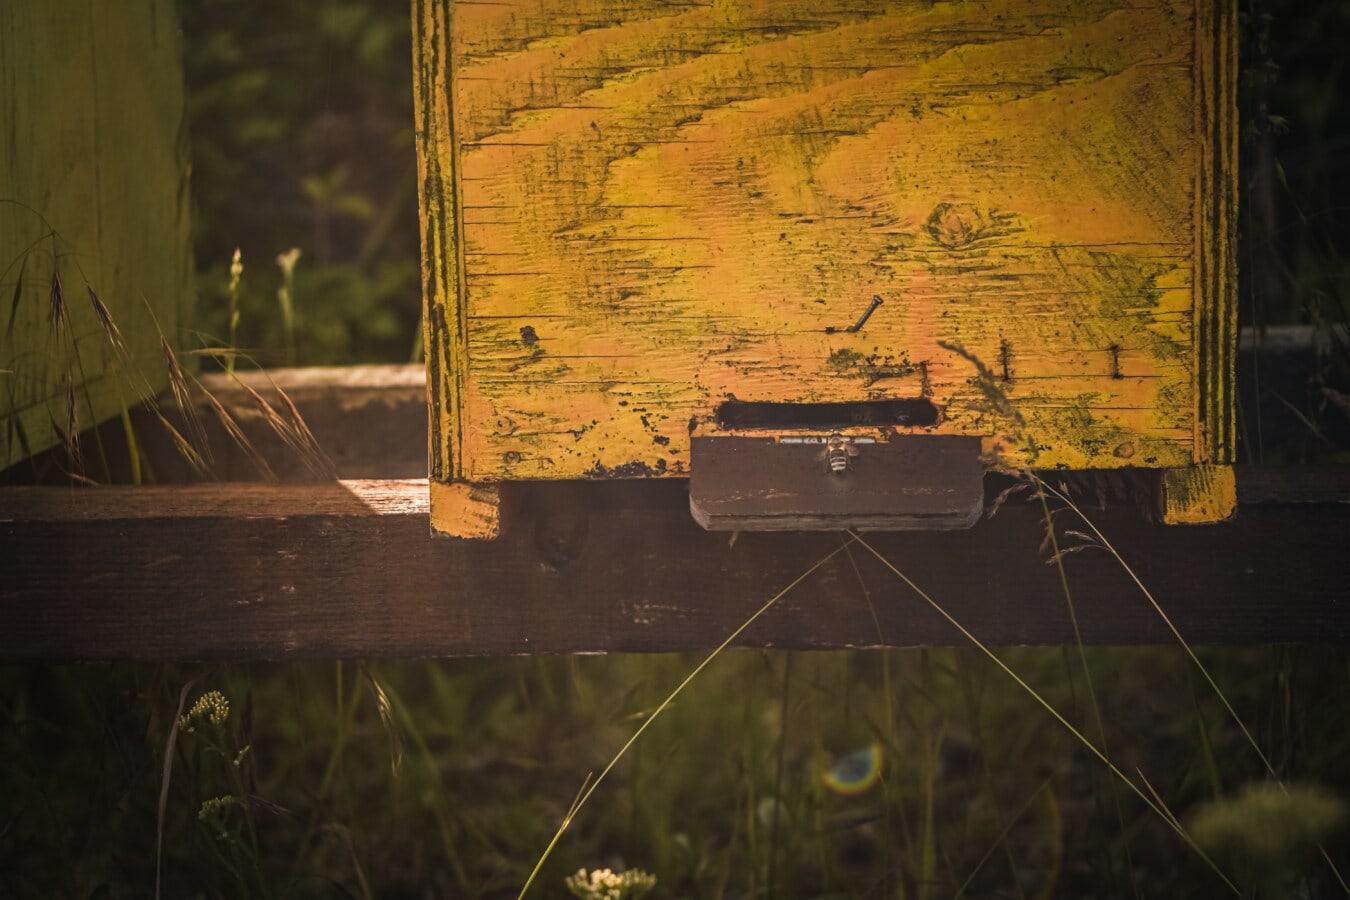 abeille, ruche, nid d'abeille, rural, vintage, bois, vieux, retro, art, antique